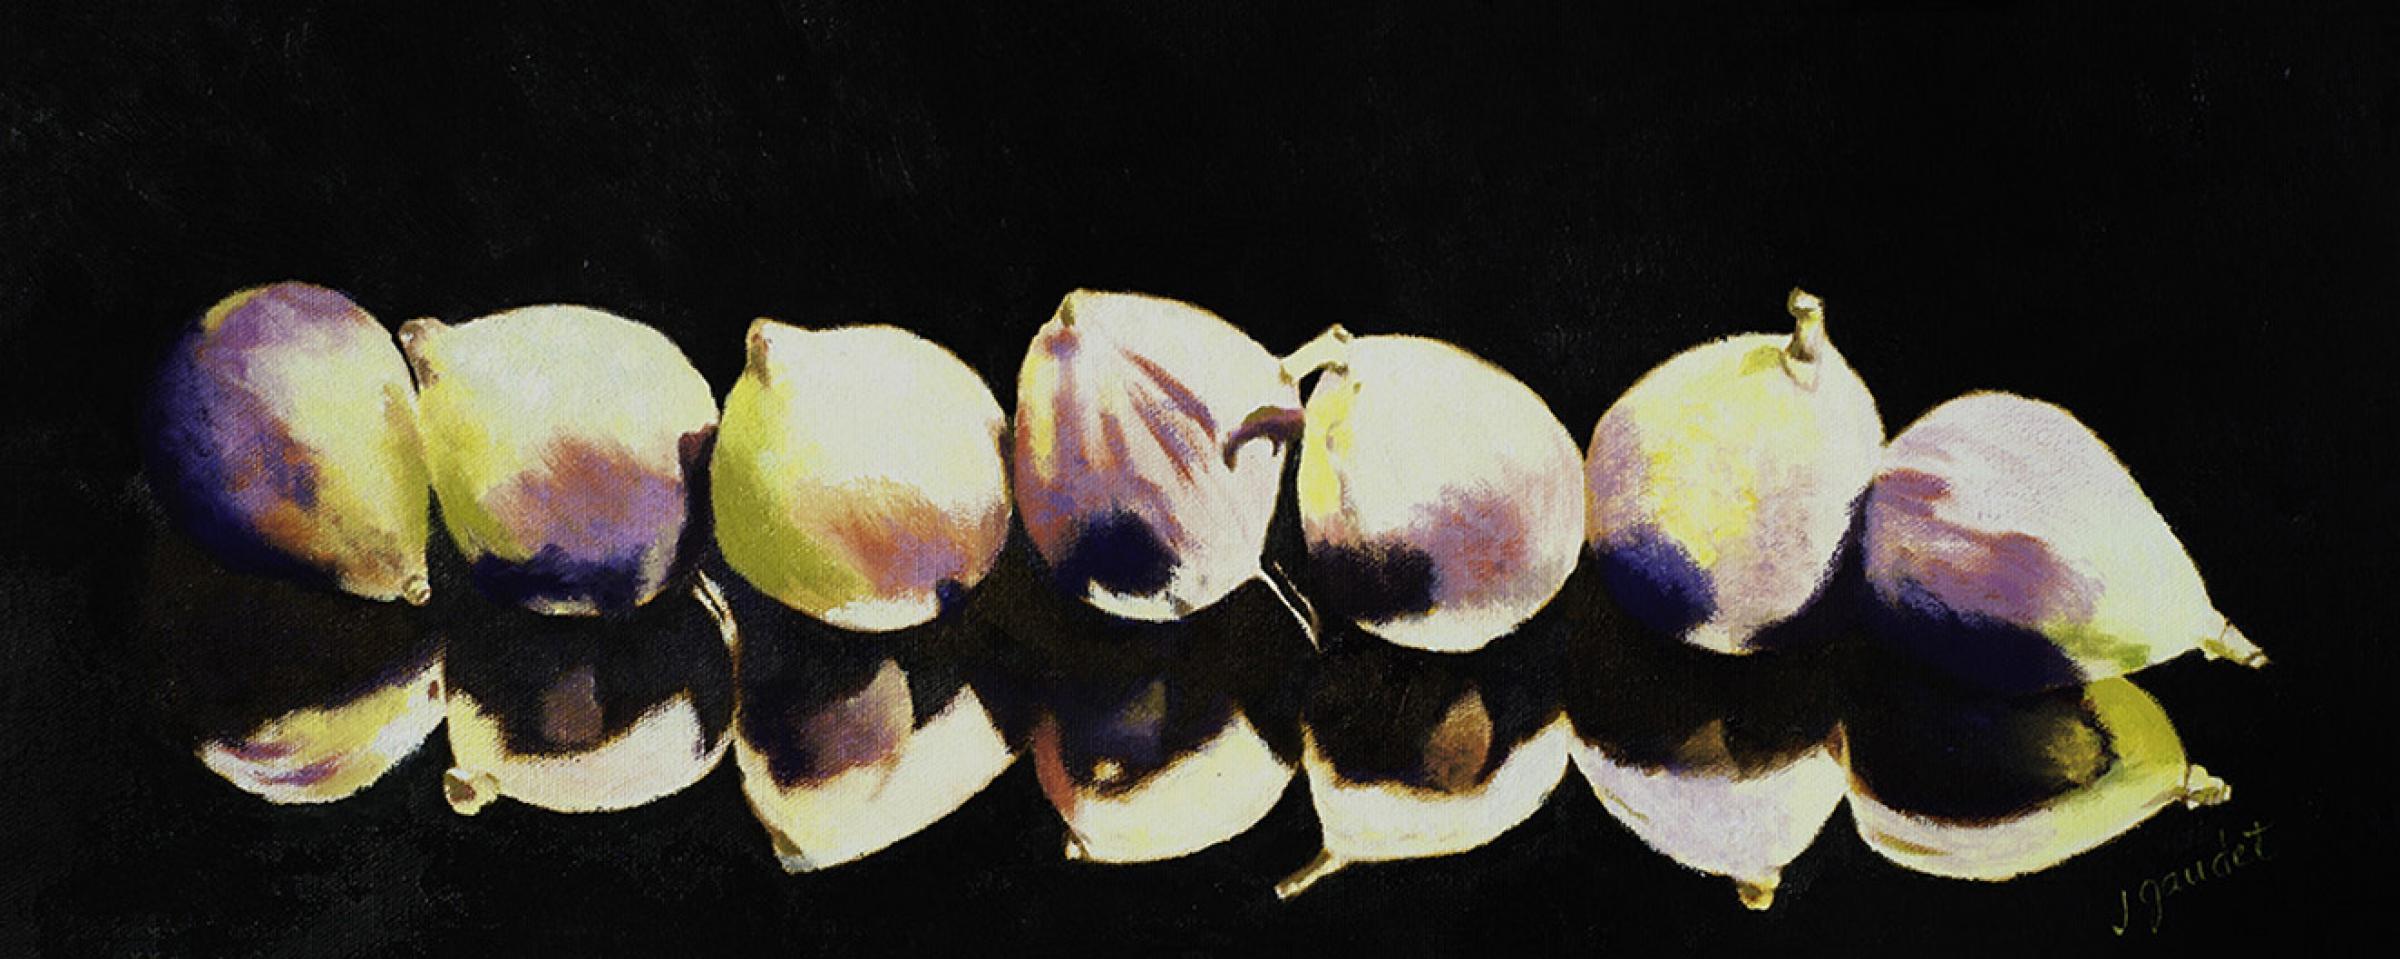 Figs-uratively by Jeanne d\'Arc Gaudet